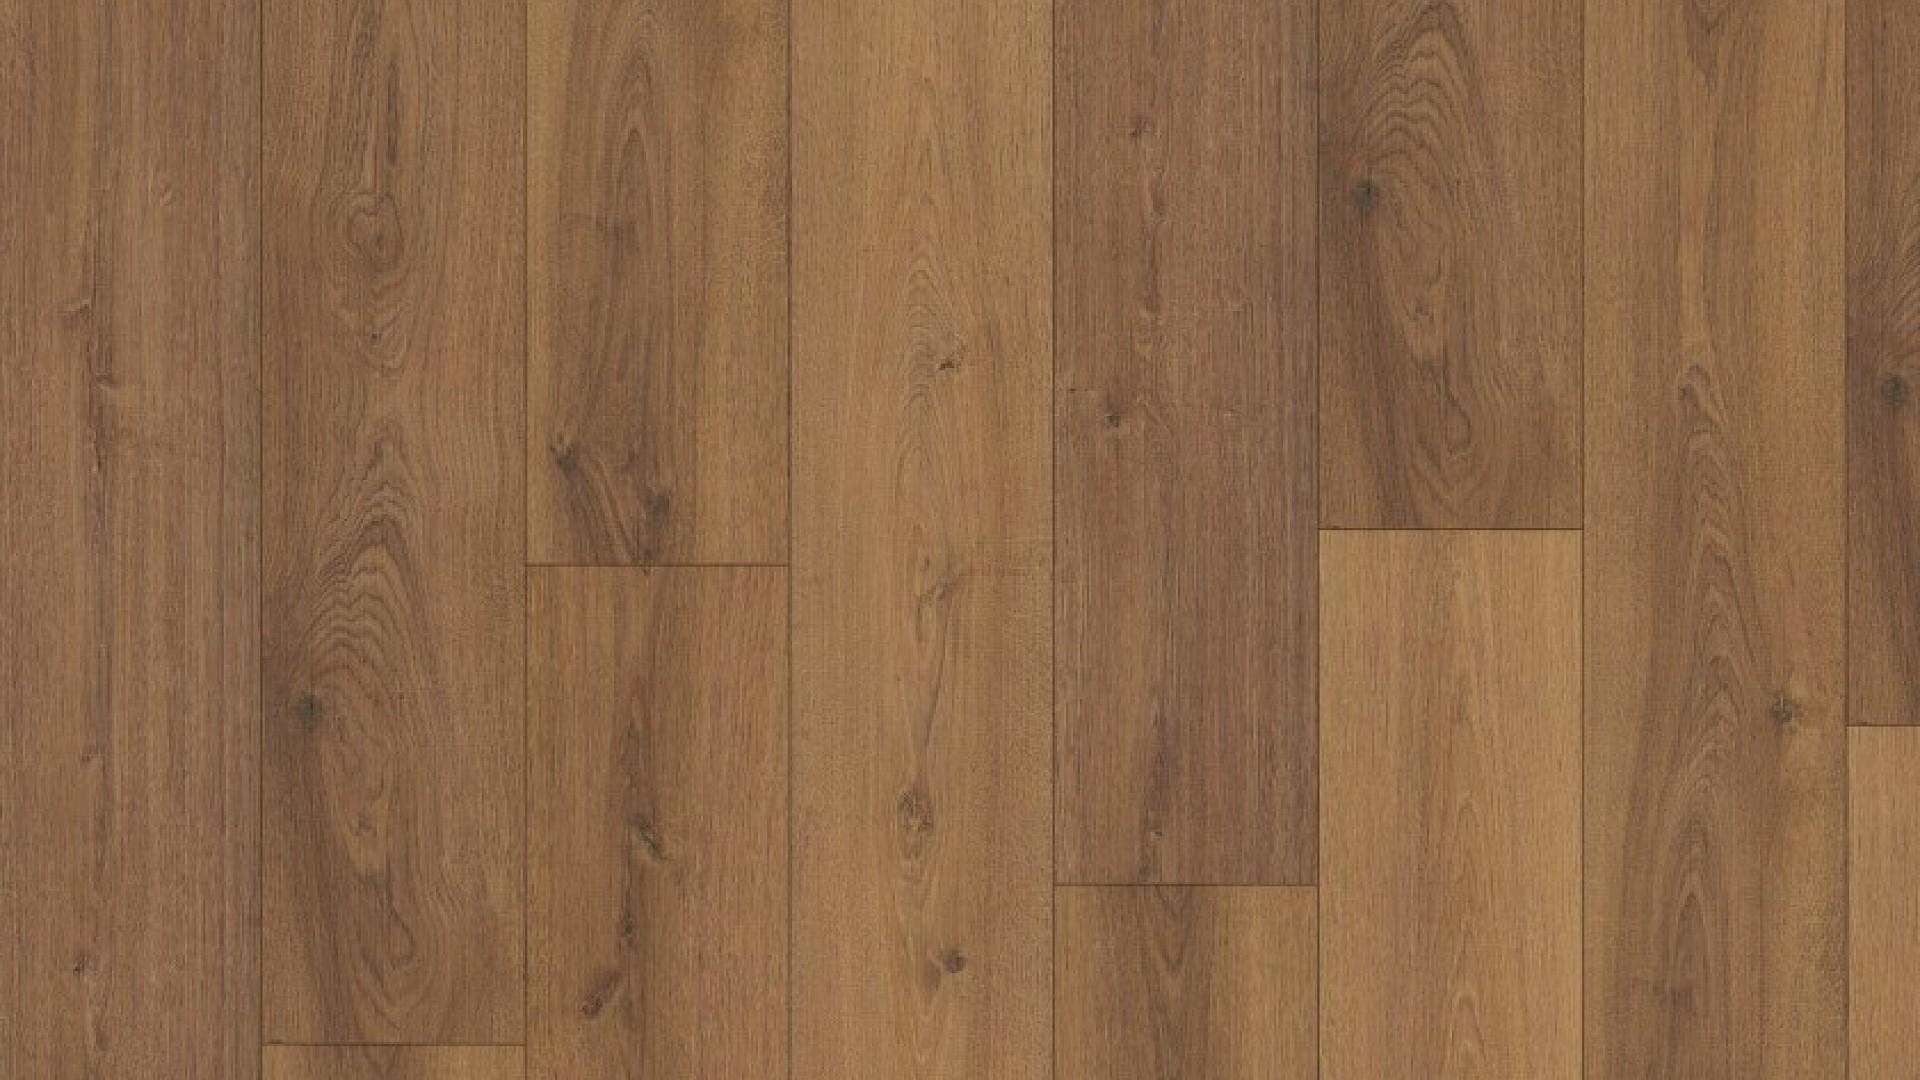 Oak Trilogy 8mm Aqua Toft S Floors